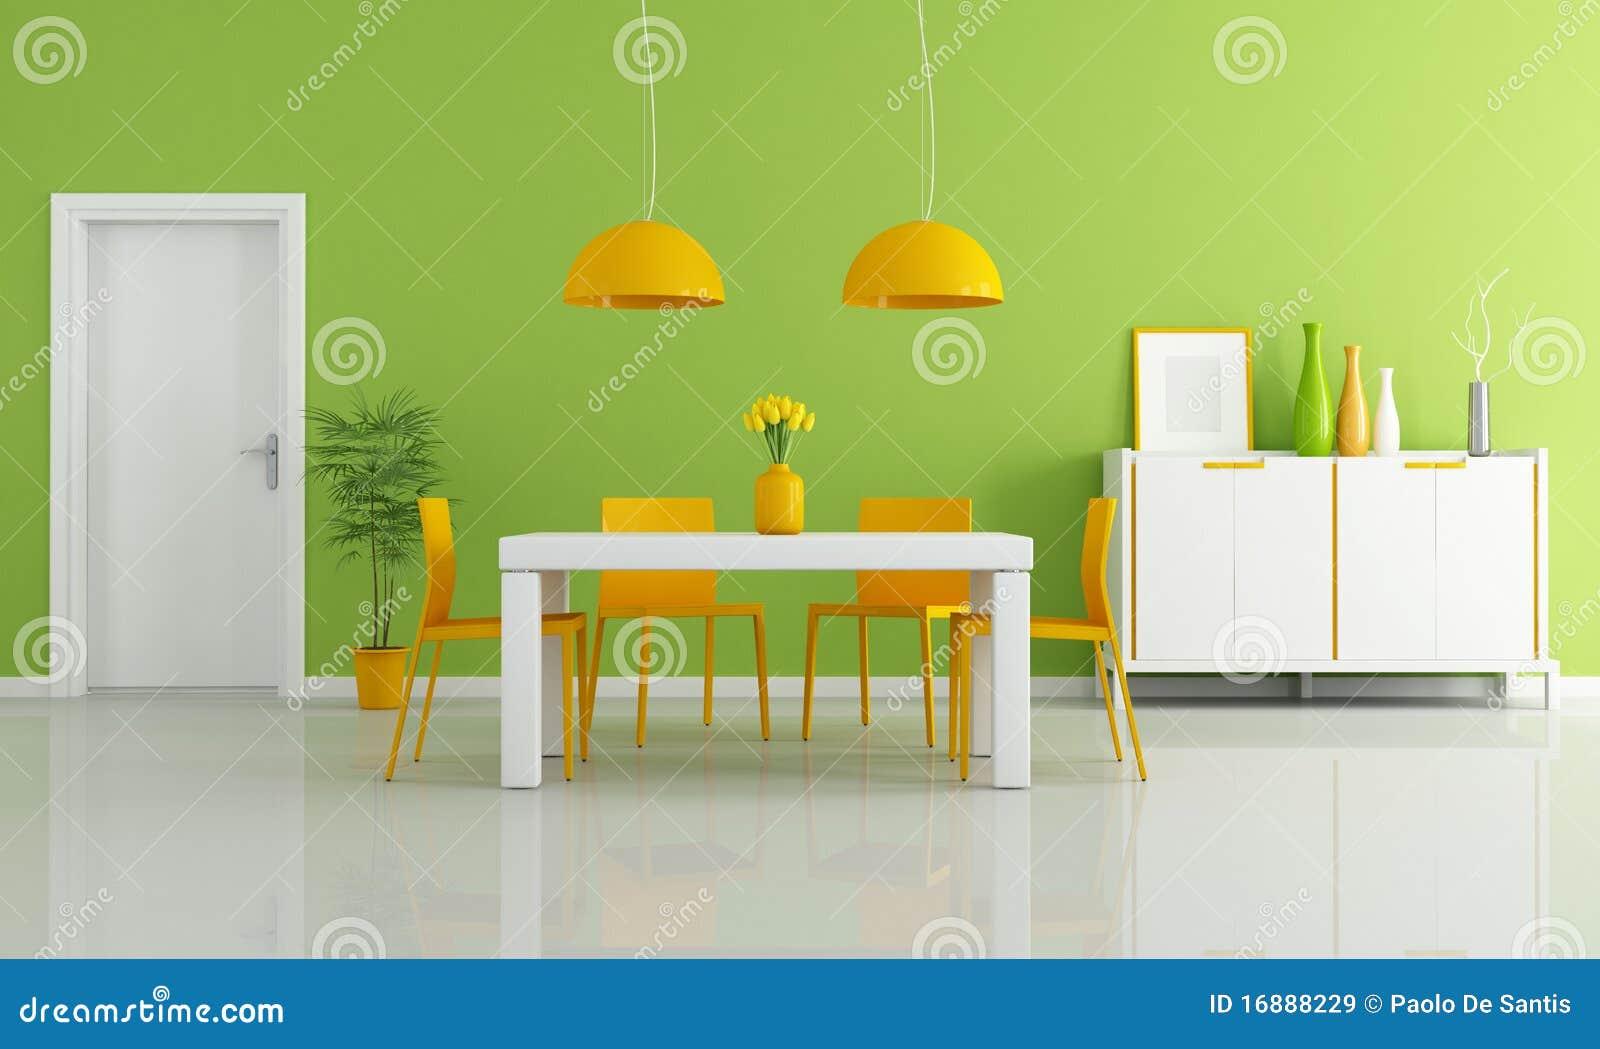 Sala Da Pranzo Moderna Colorata Immagini Stock Libere Da Diritti  #BF8A0C 1300 870 Sala Da Pranzo Arte Contemporanea